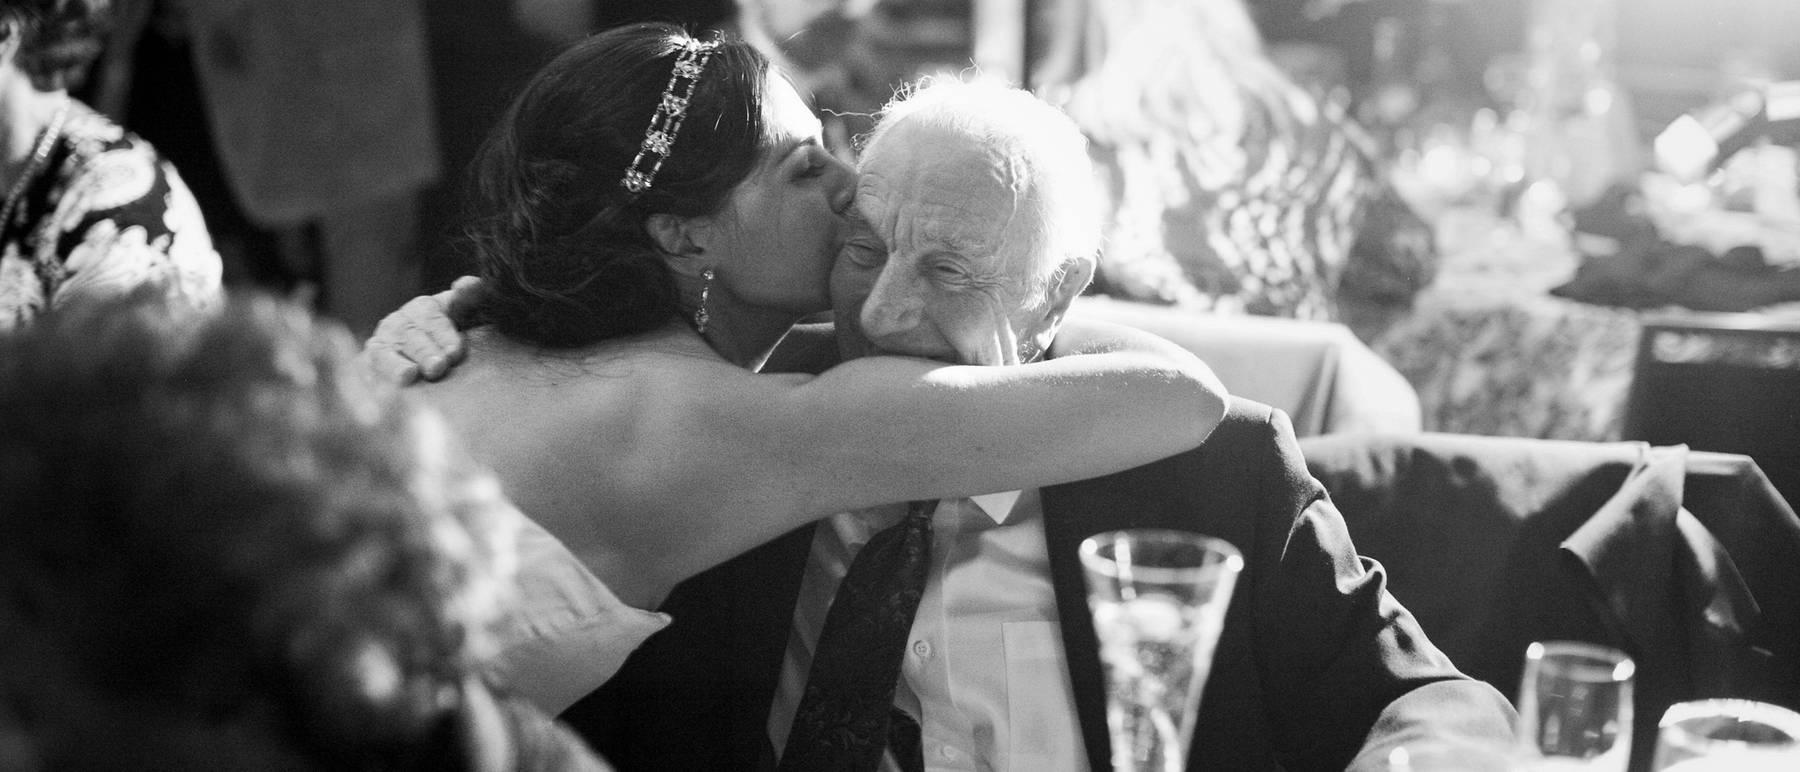 johnandjoseph-wedding-photographer-hz-slider-242